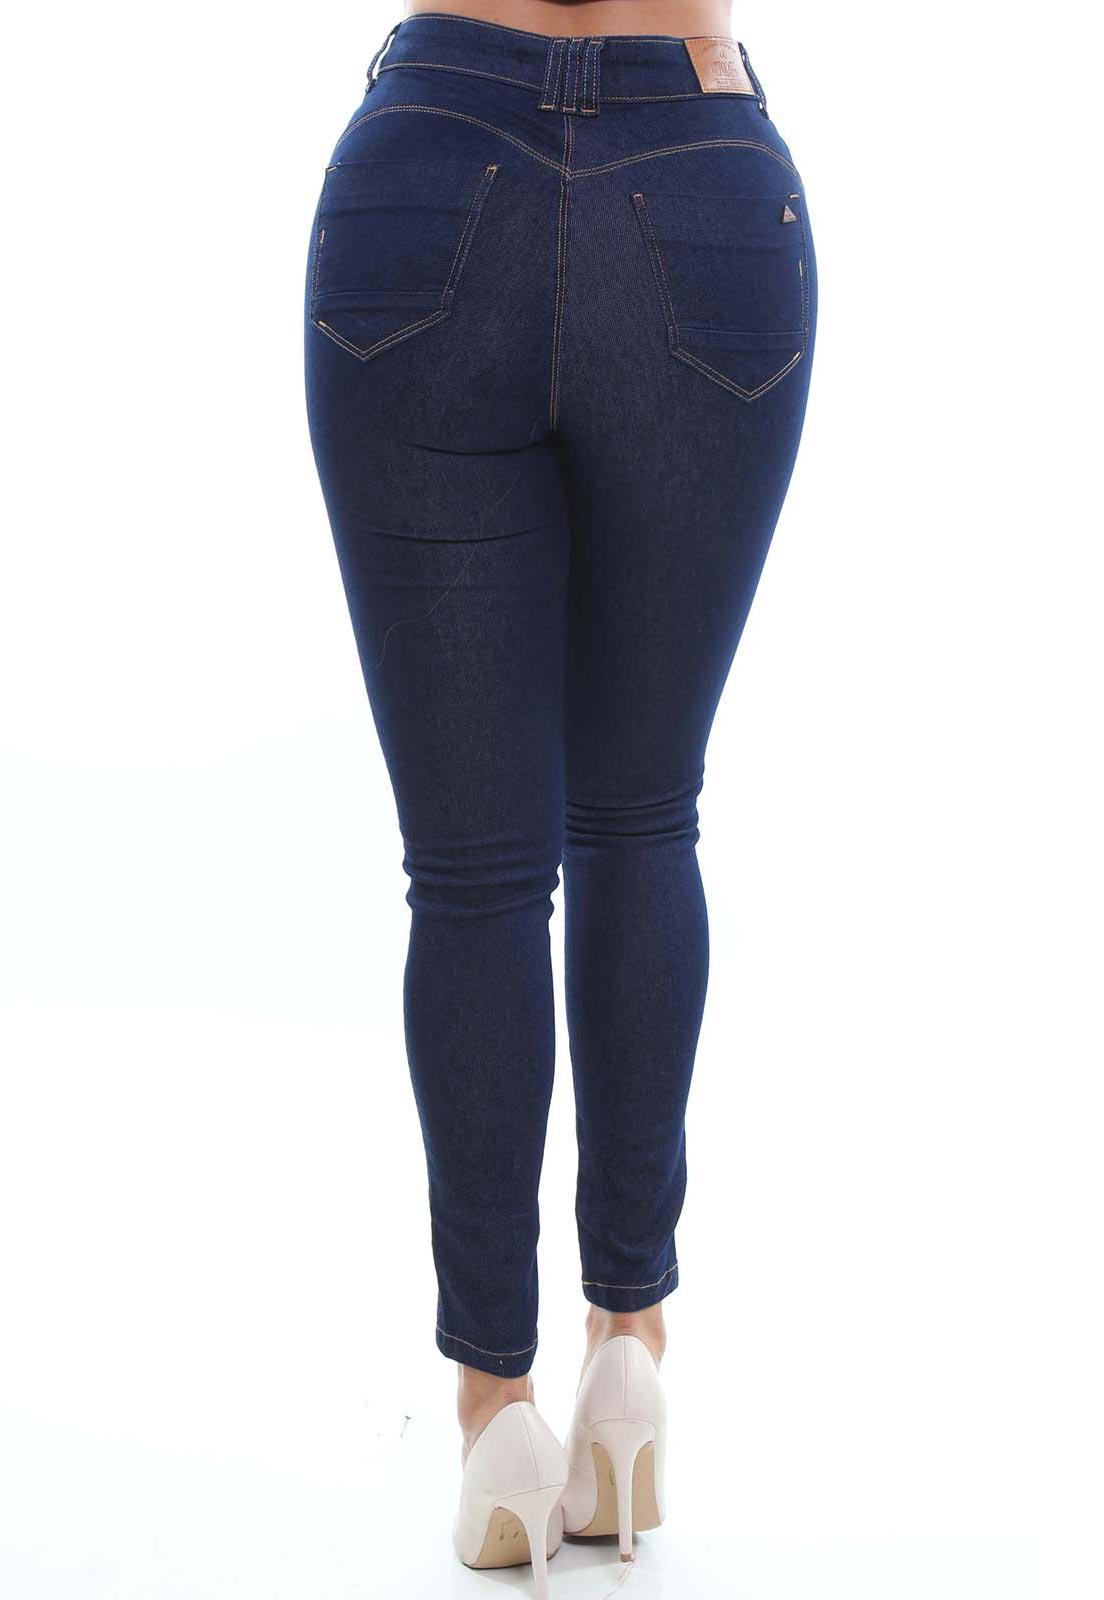 Cigarrete  Jeans Feminina Crocker - 48039  - CROCKER JEANS